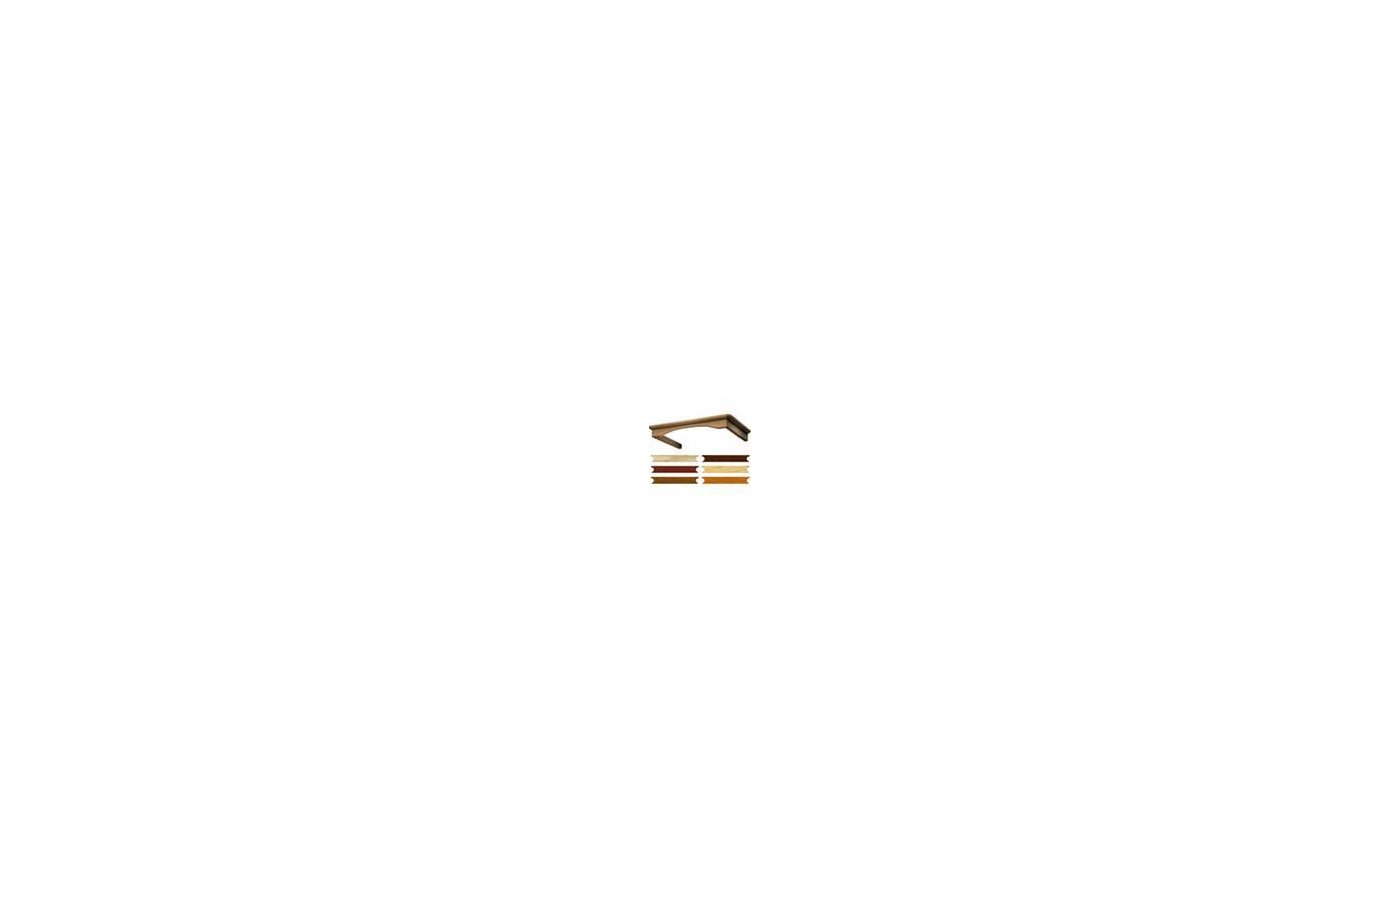 Аксессуар для в/о KRONA комплект багетов для Adelia CPB/G1/3 (темн.орех) в упаковке